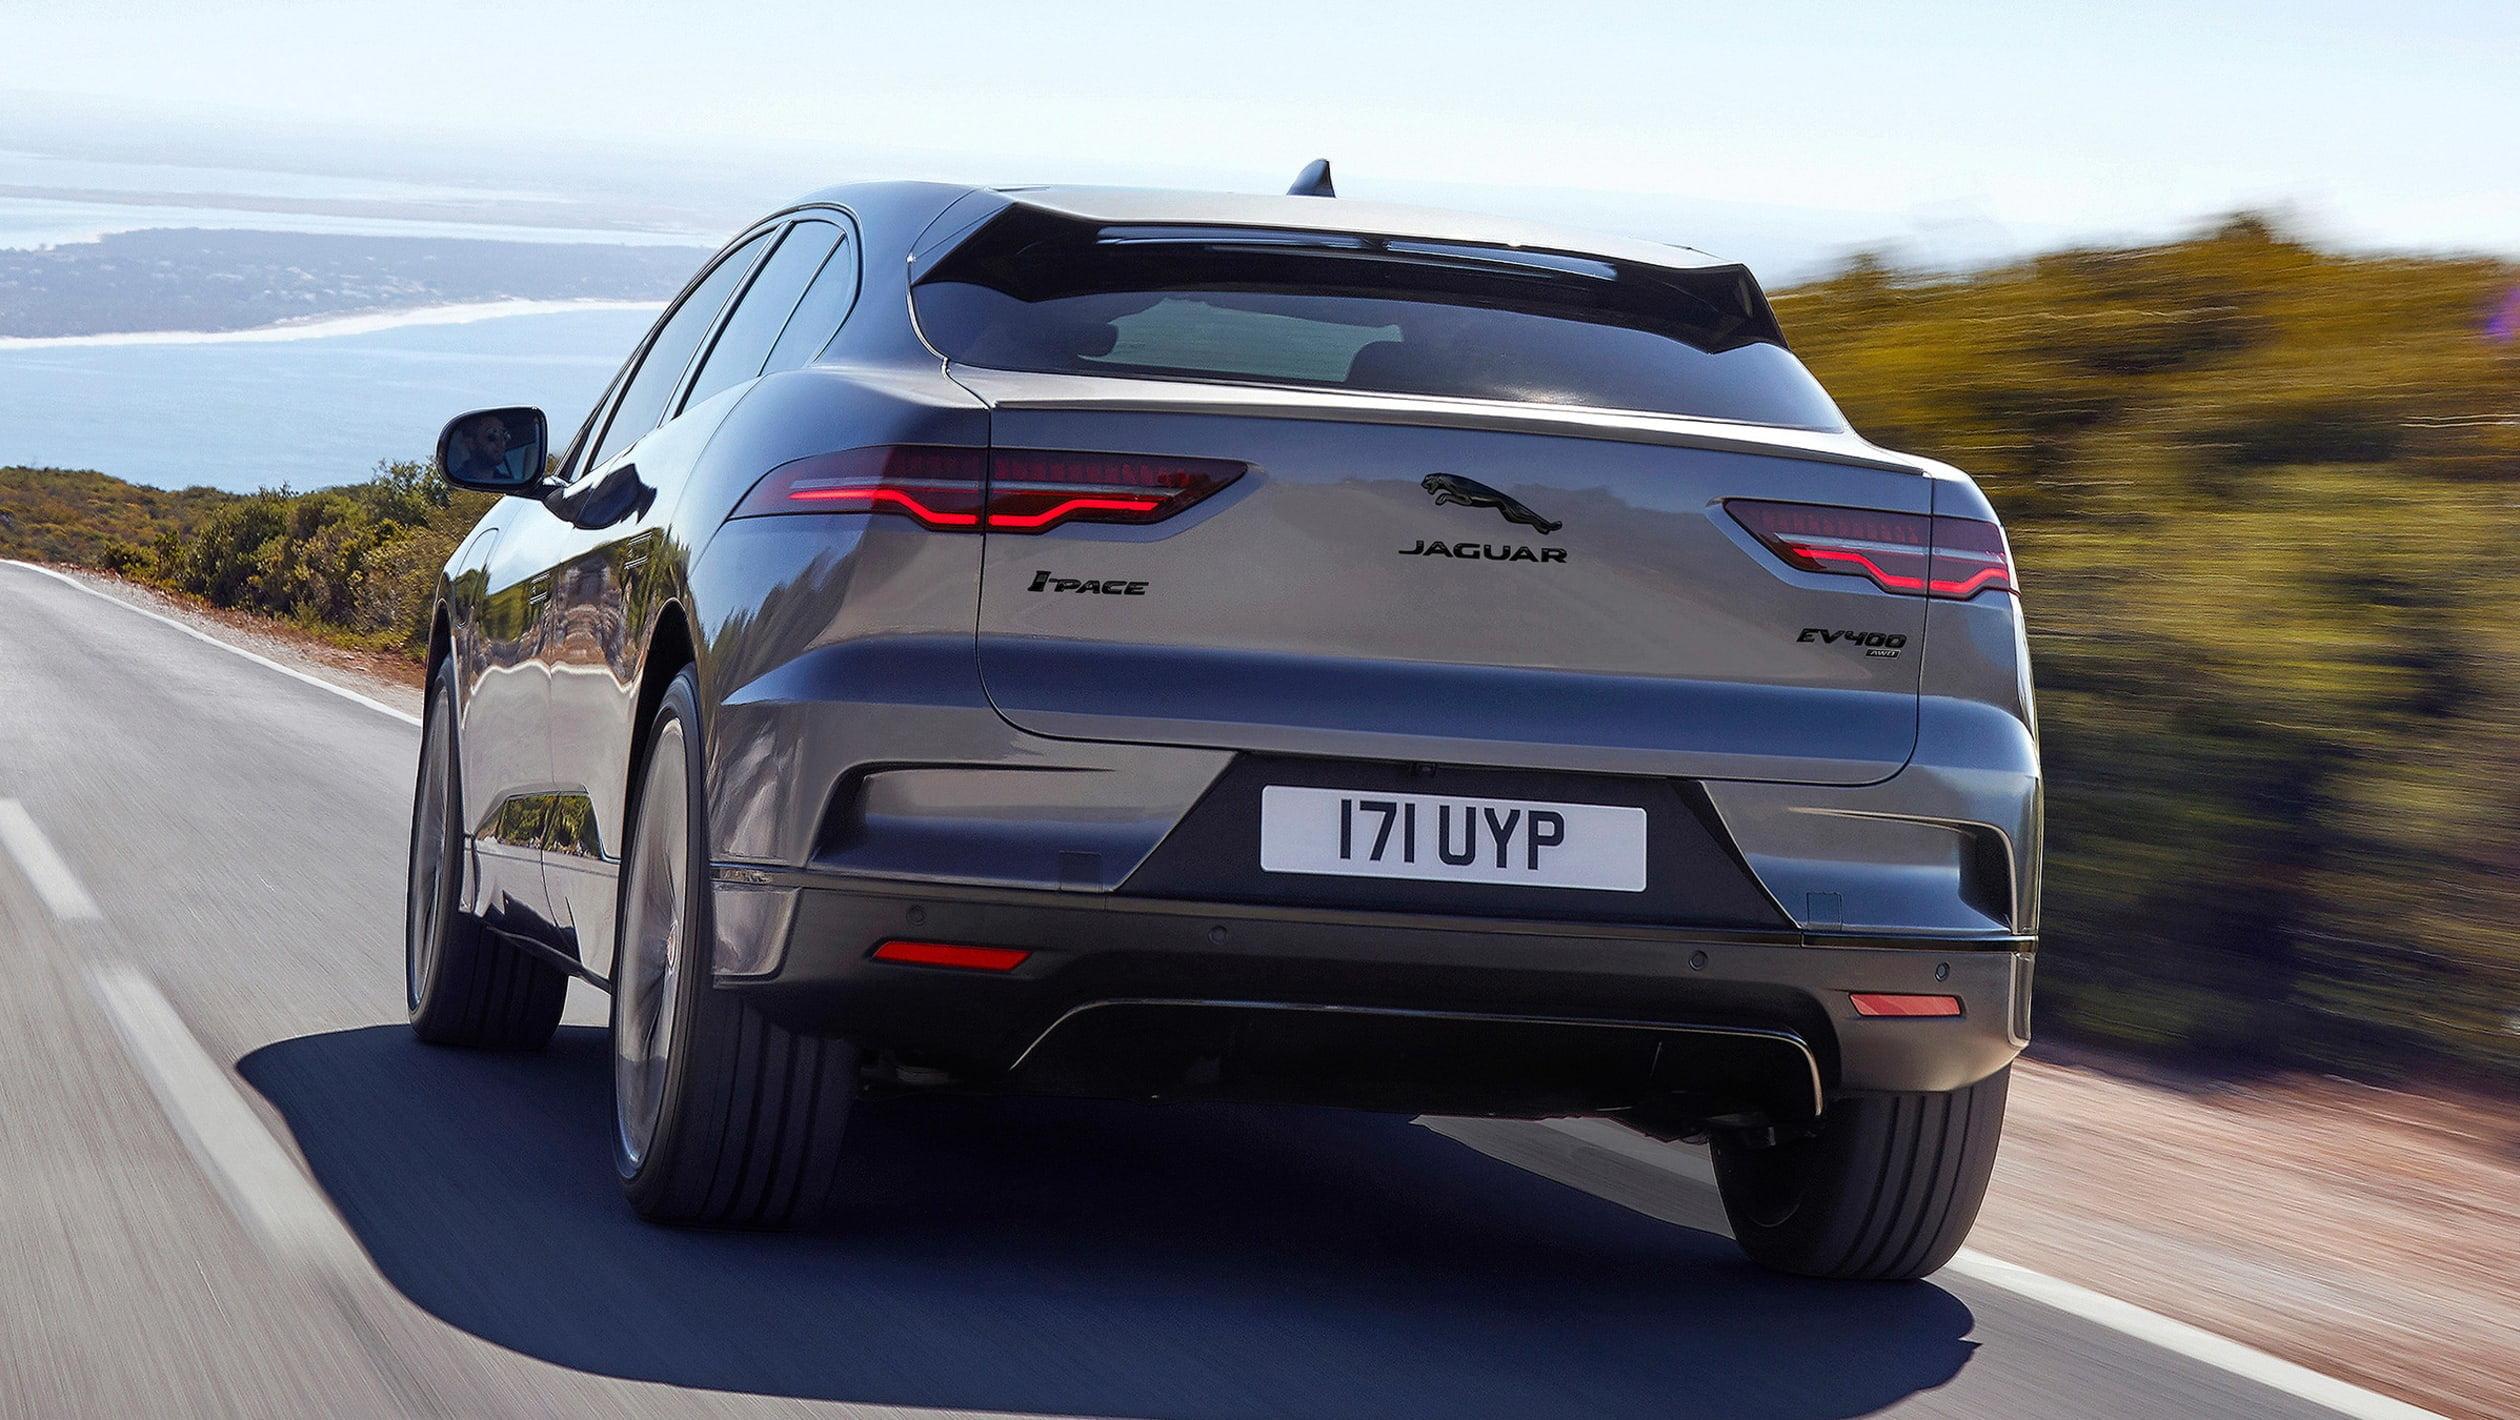 2020 jaguar I-Pace elektrikli araba ön sipariş https://huglero.com